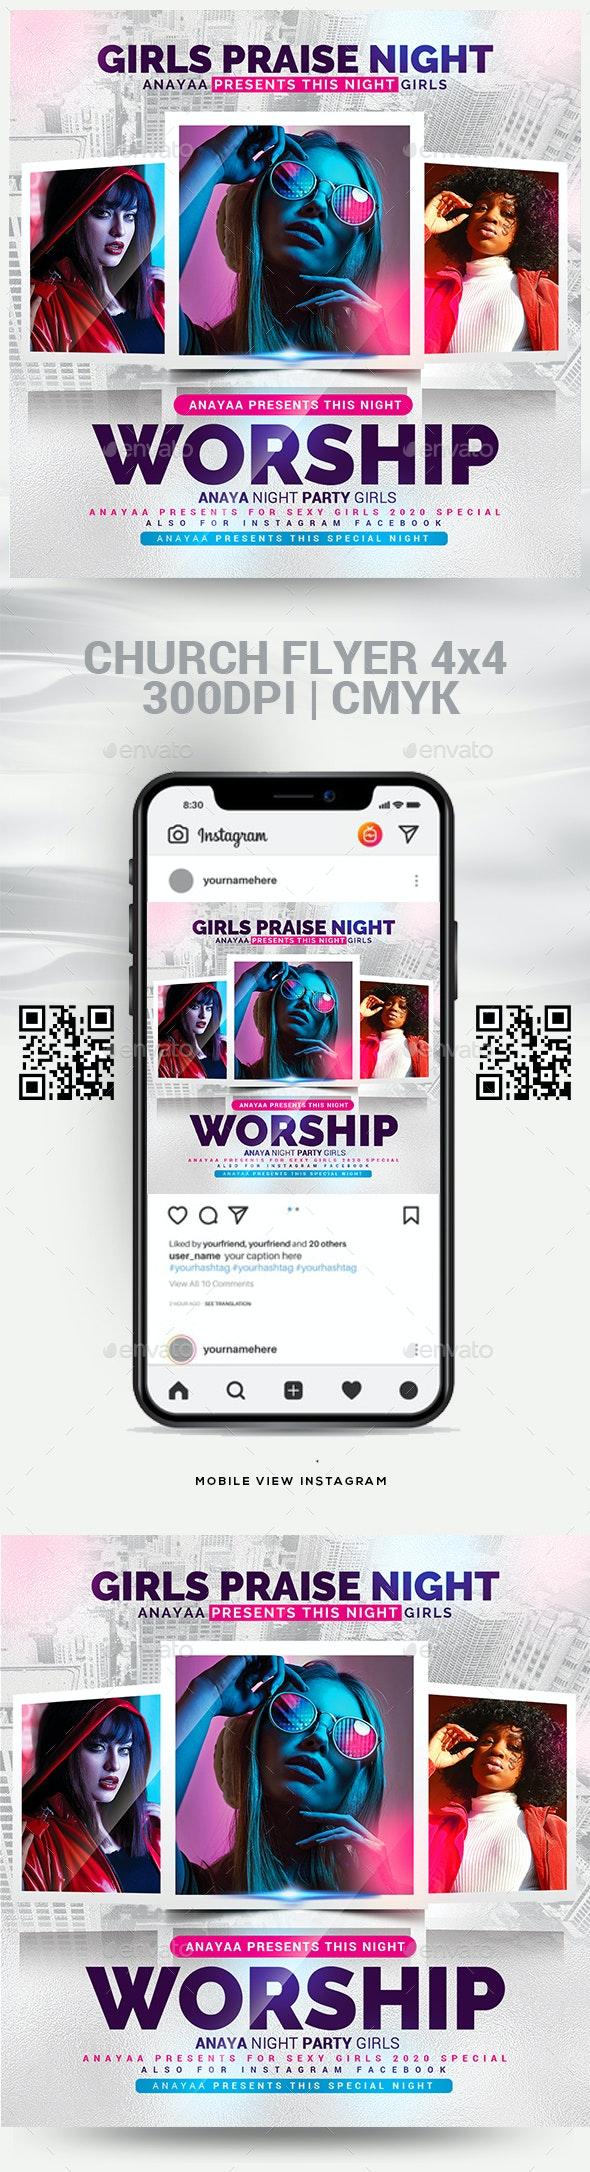 Church Flyer Template - Church Flyers